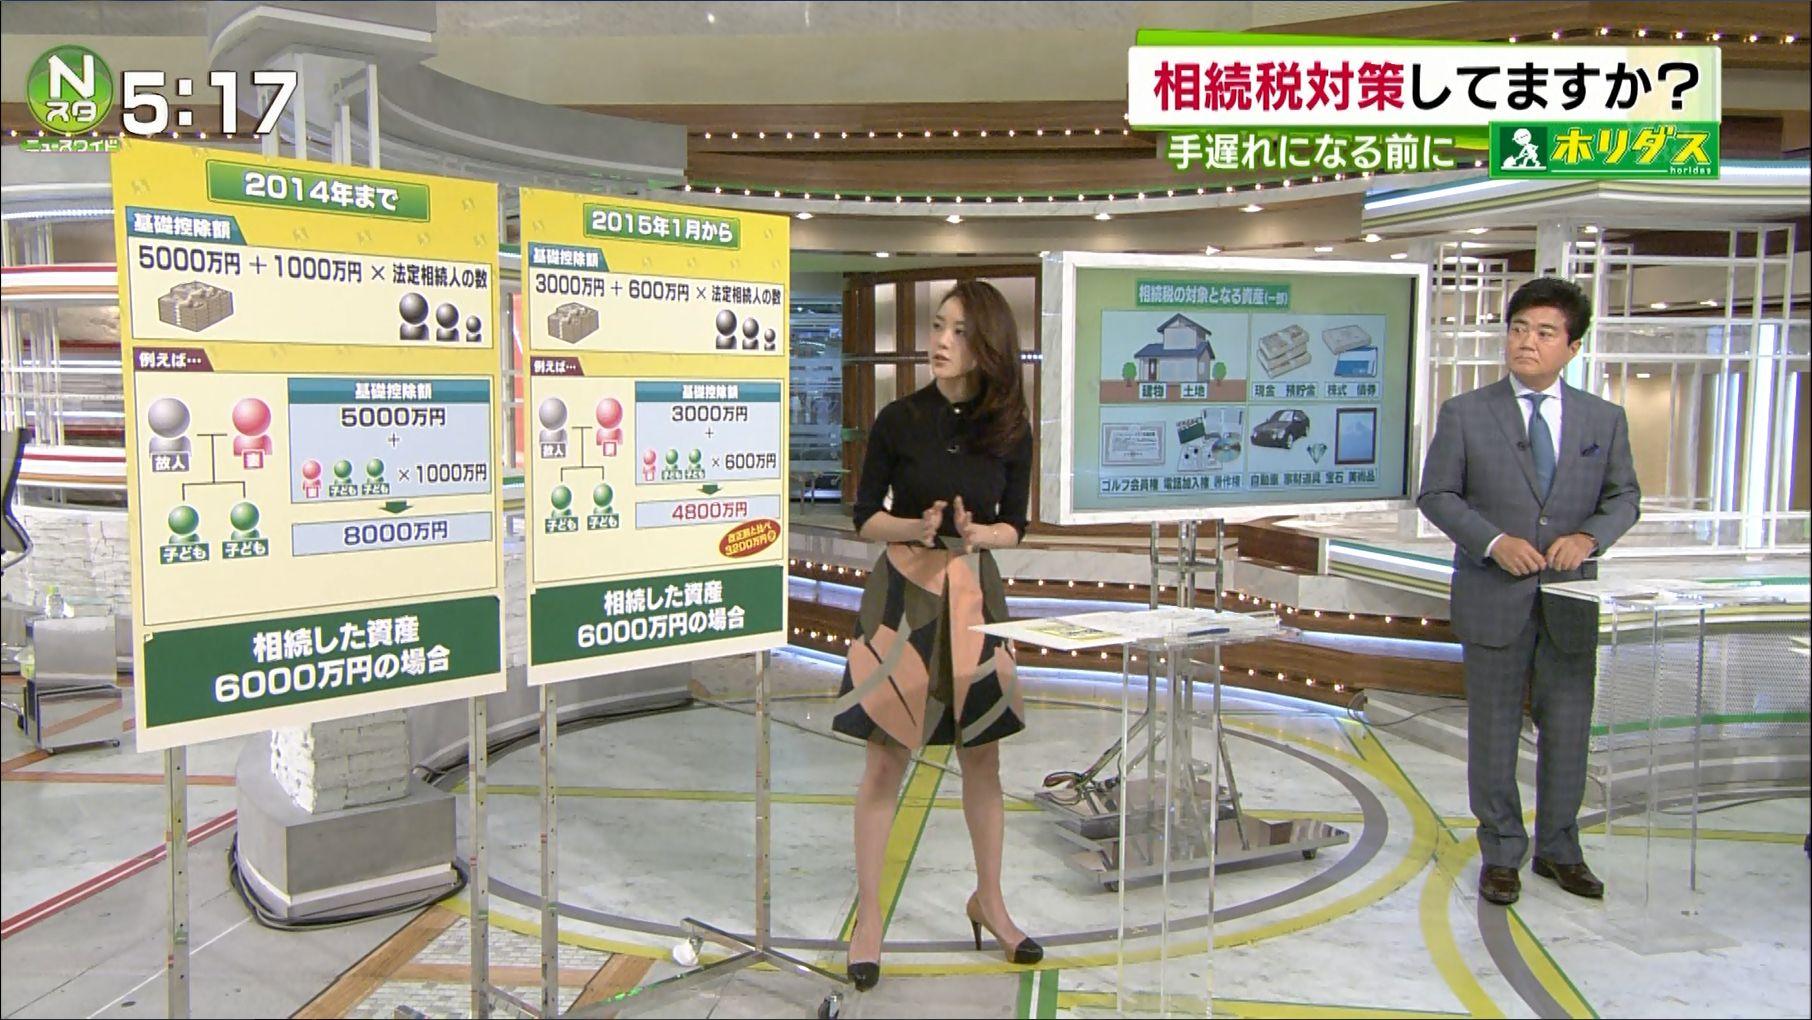 TBS★古谷有美 Vol.17★Nスタ [無断転載禁止]©2ch.netYouTube動画>3本 ->画像>405枚